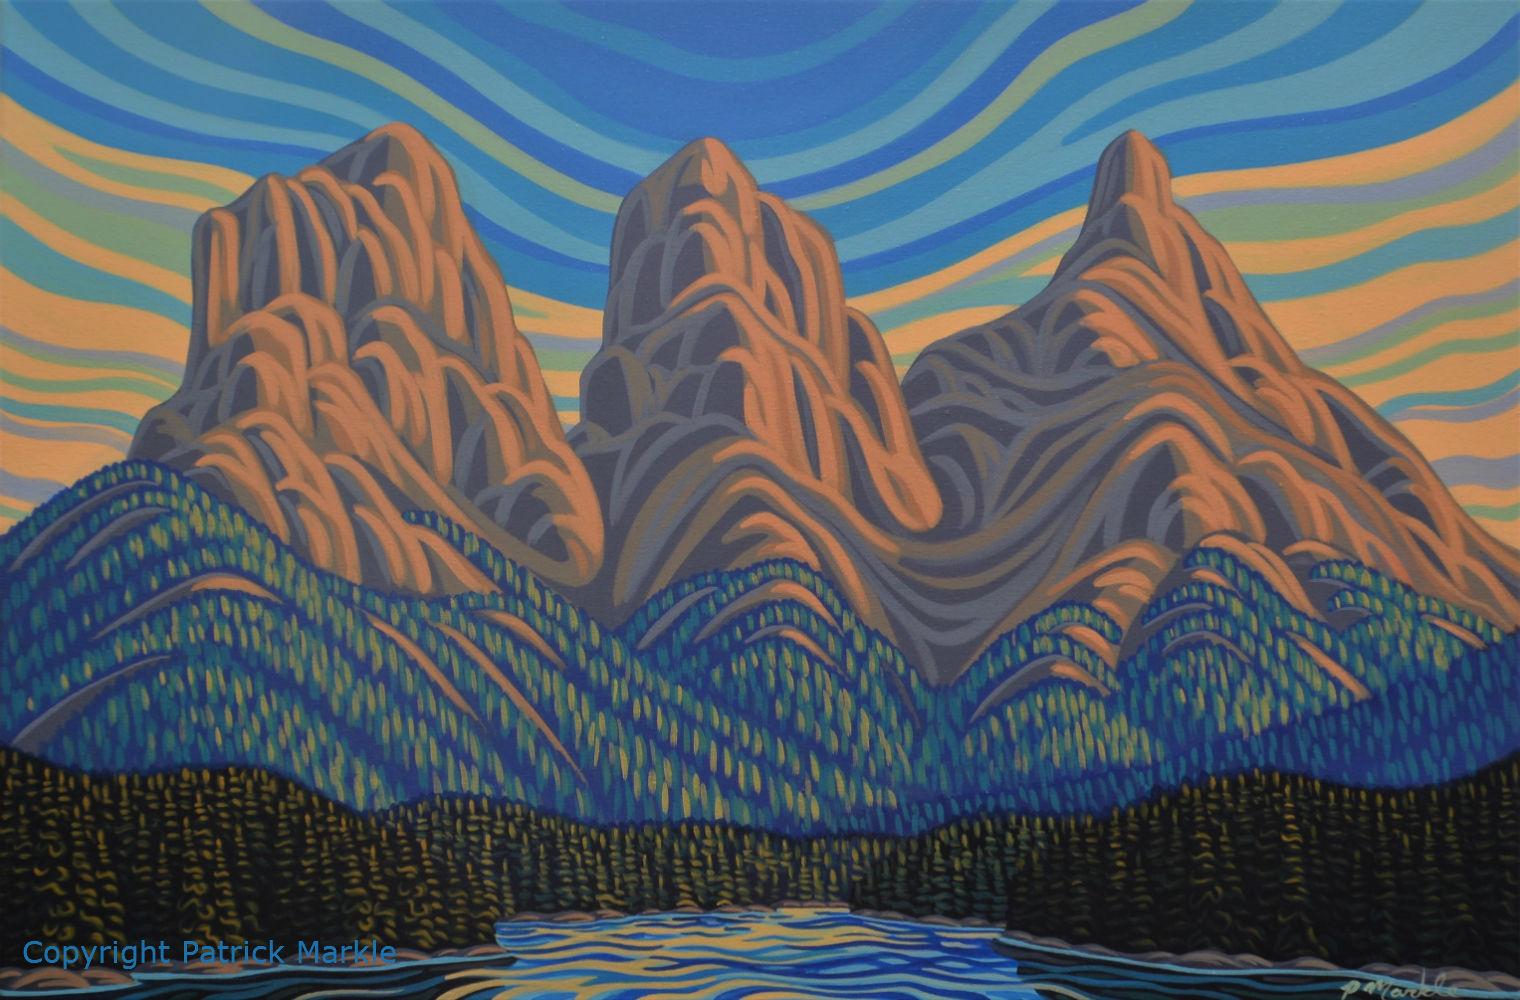 Patrick Markle, Canadian Artist, Banff, Alberta